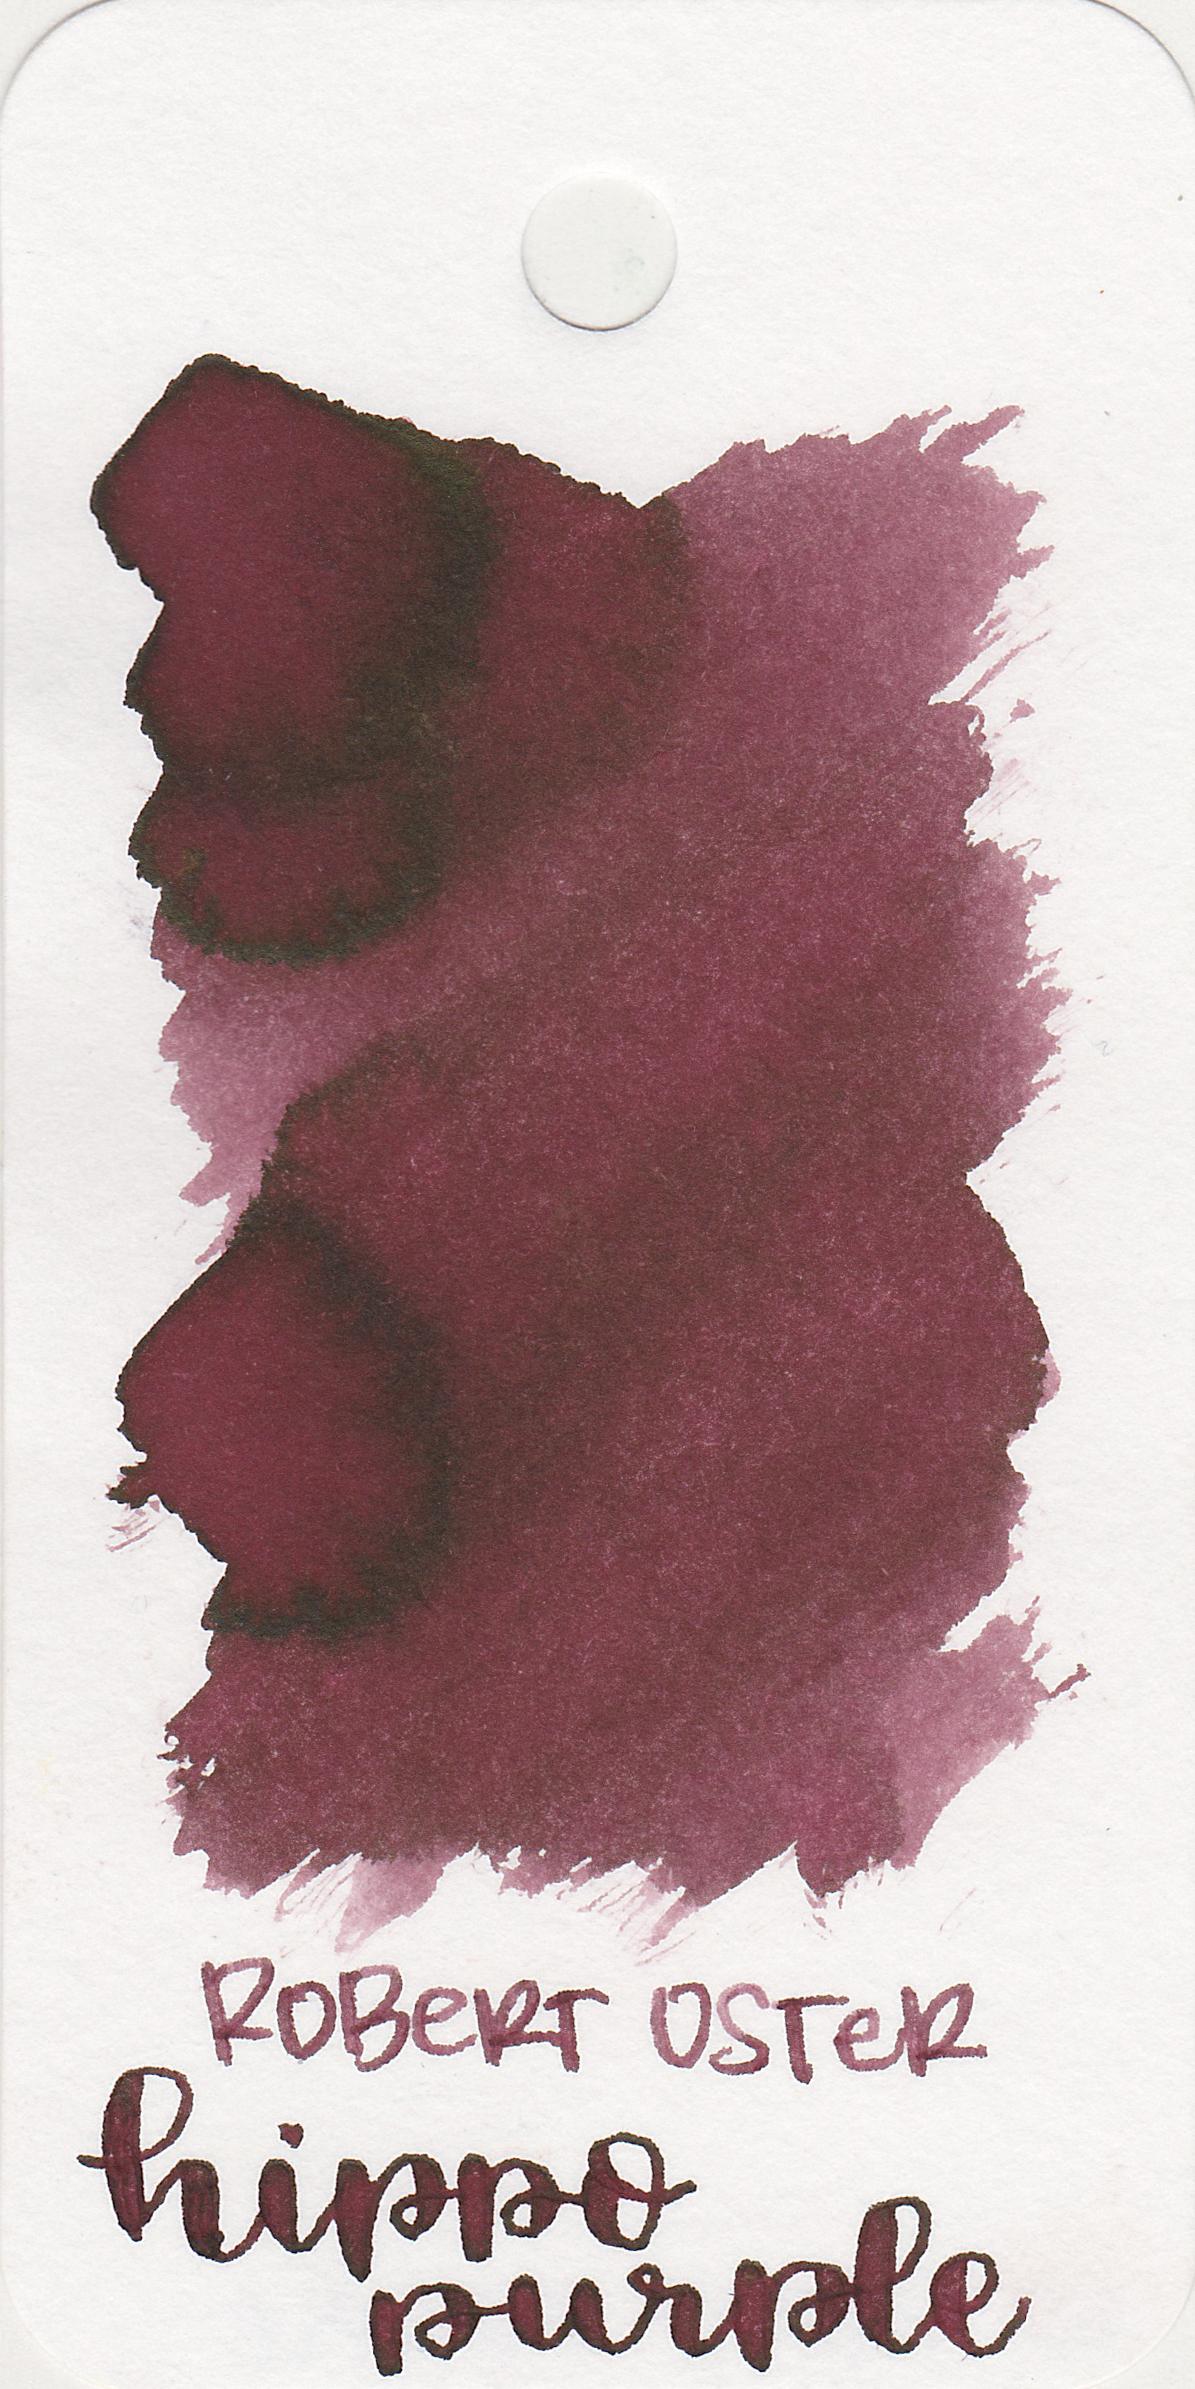 ro-hippo-purple-1.jpg